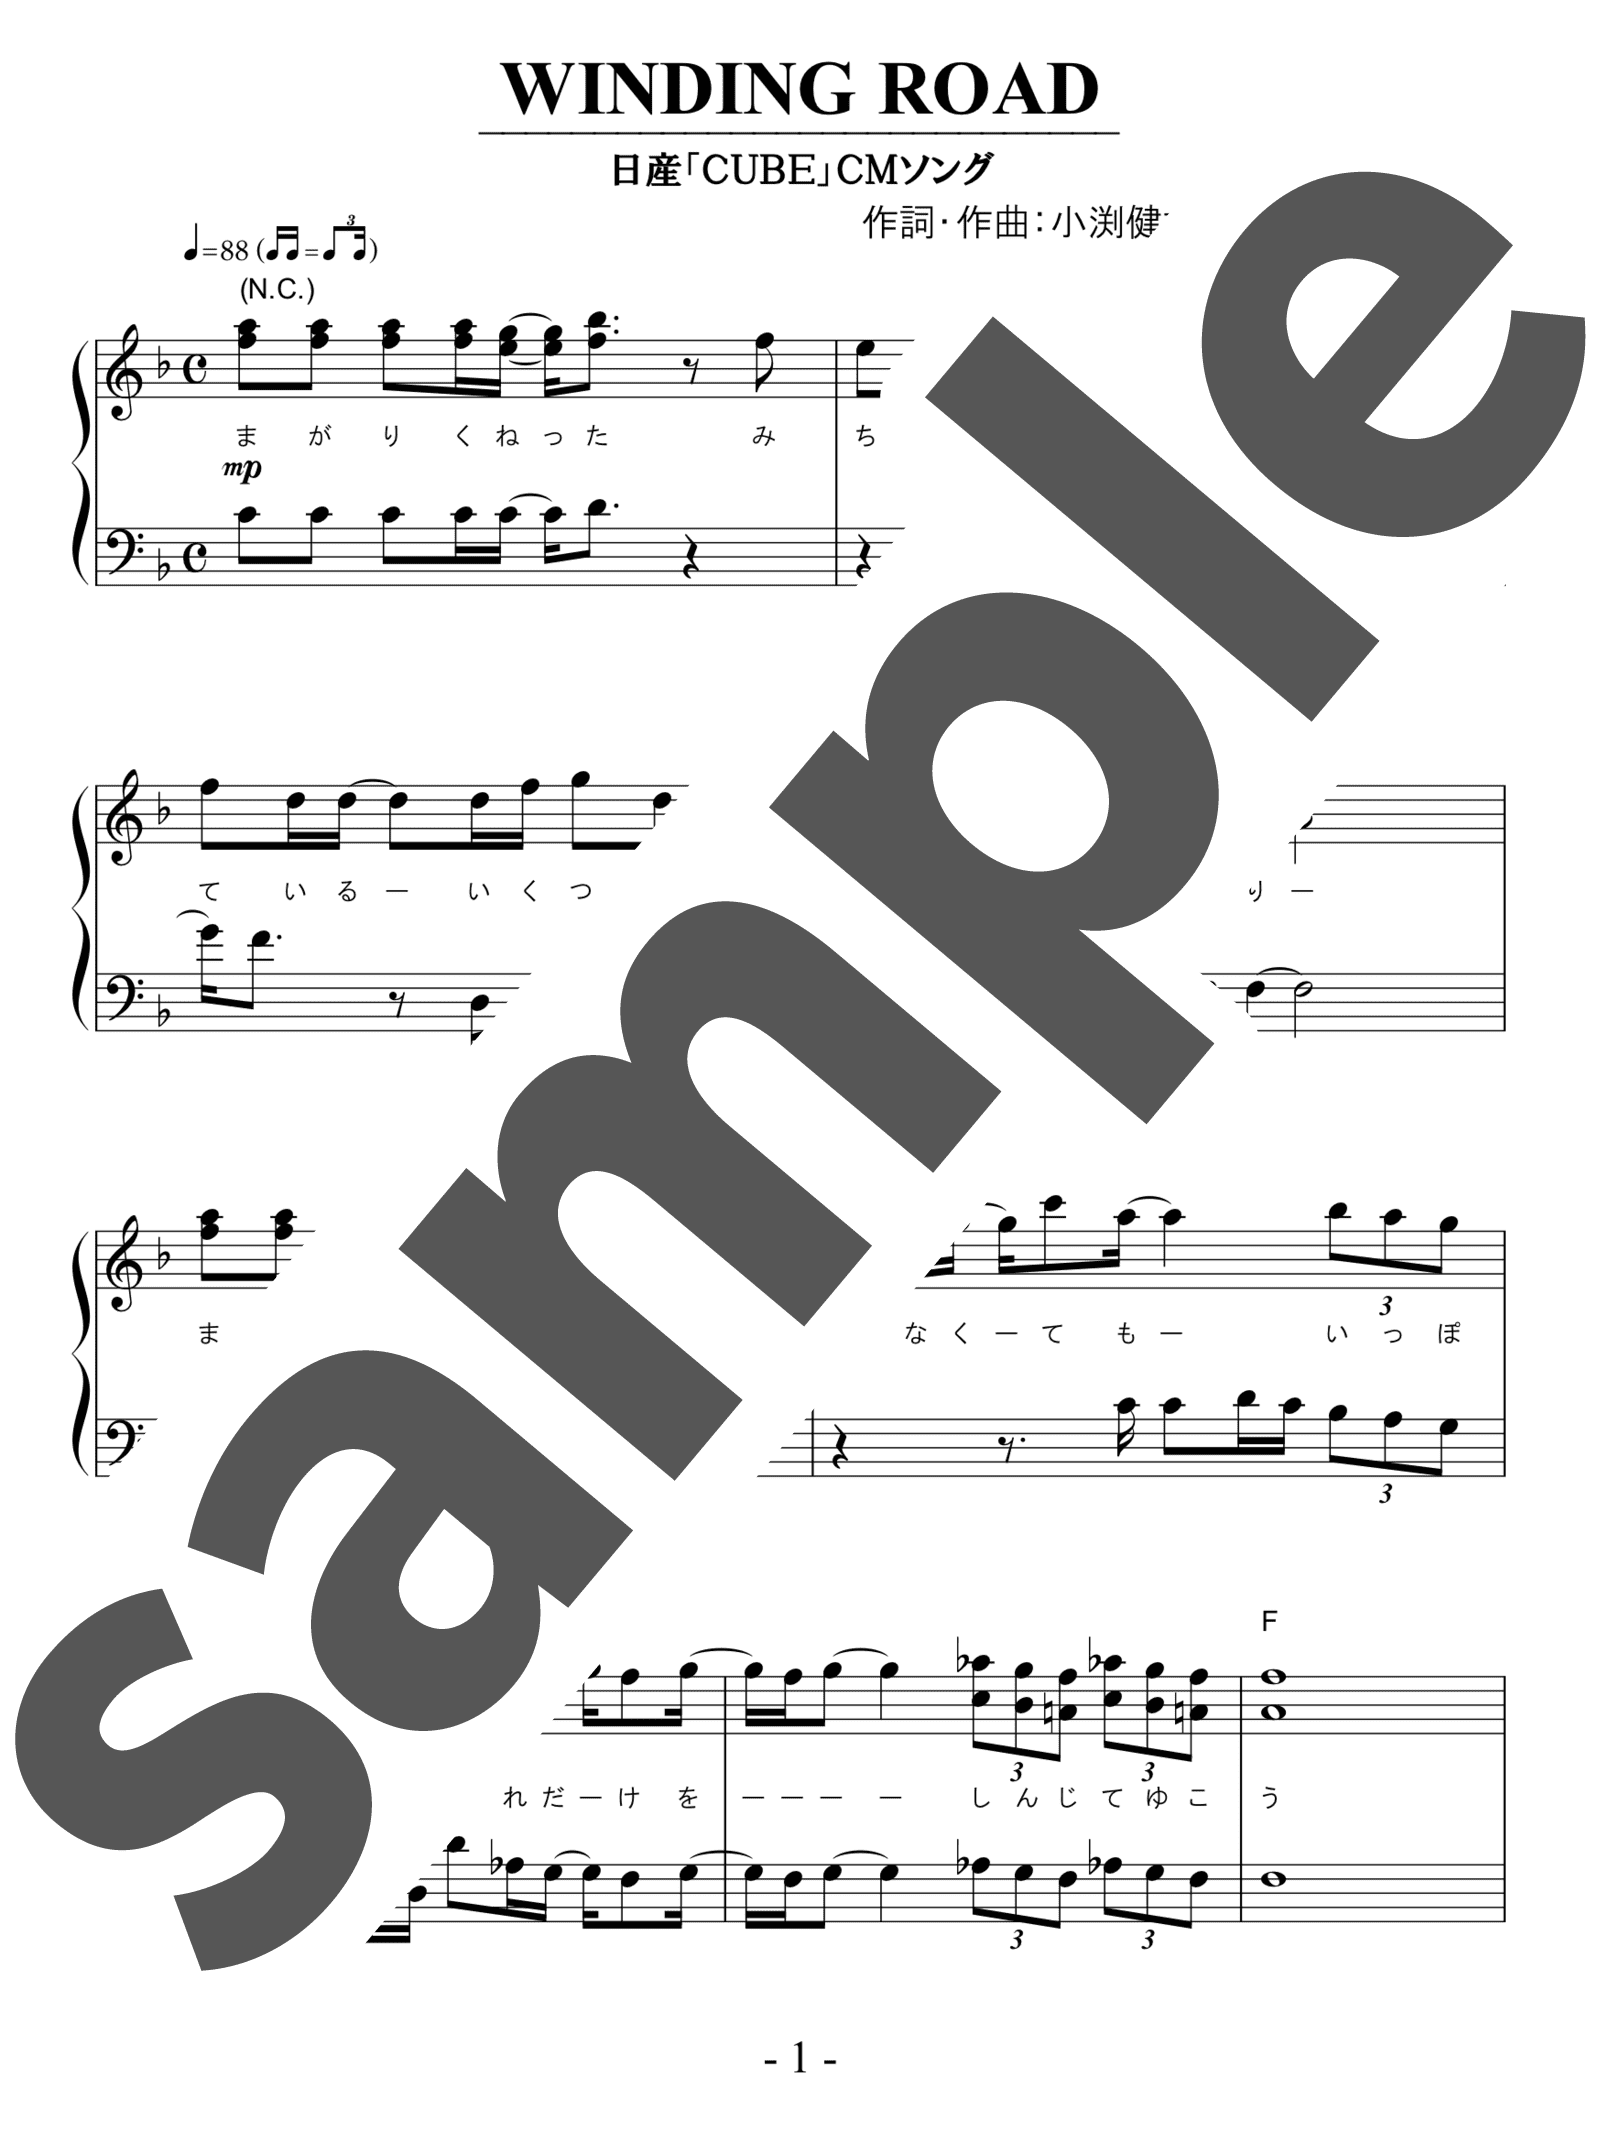 「WINDING ROAD」のサンプル楽譜